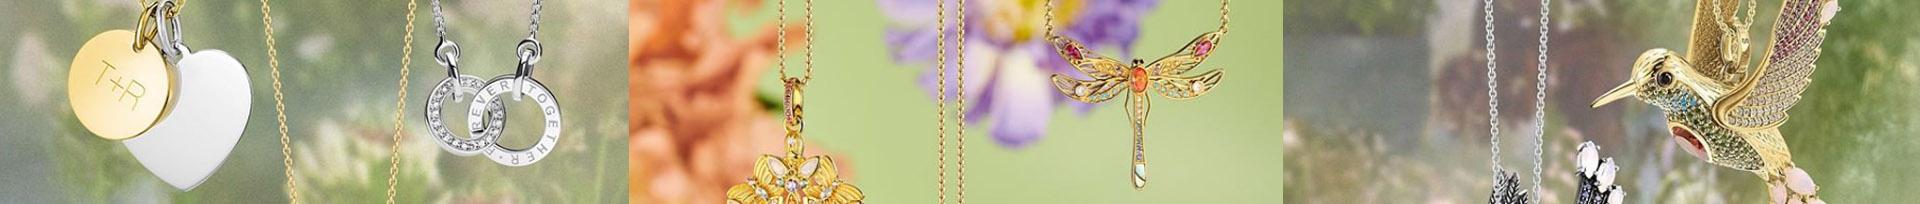 spring-jewellery-category-banner1.jpg